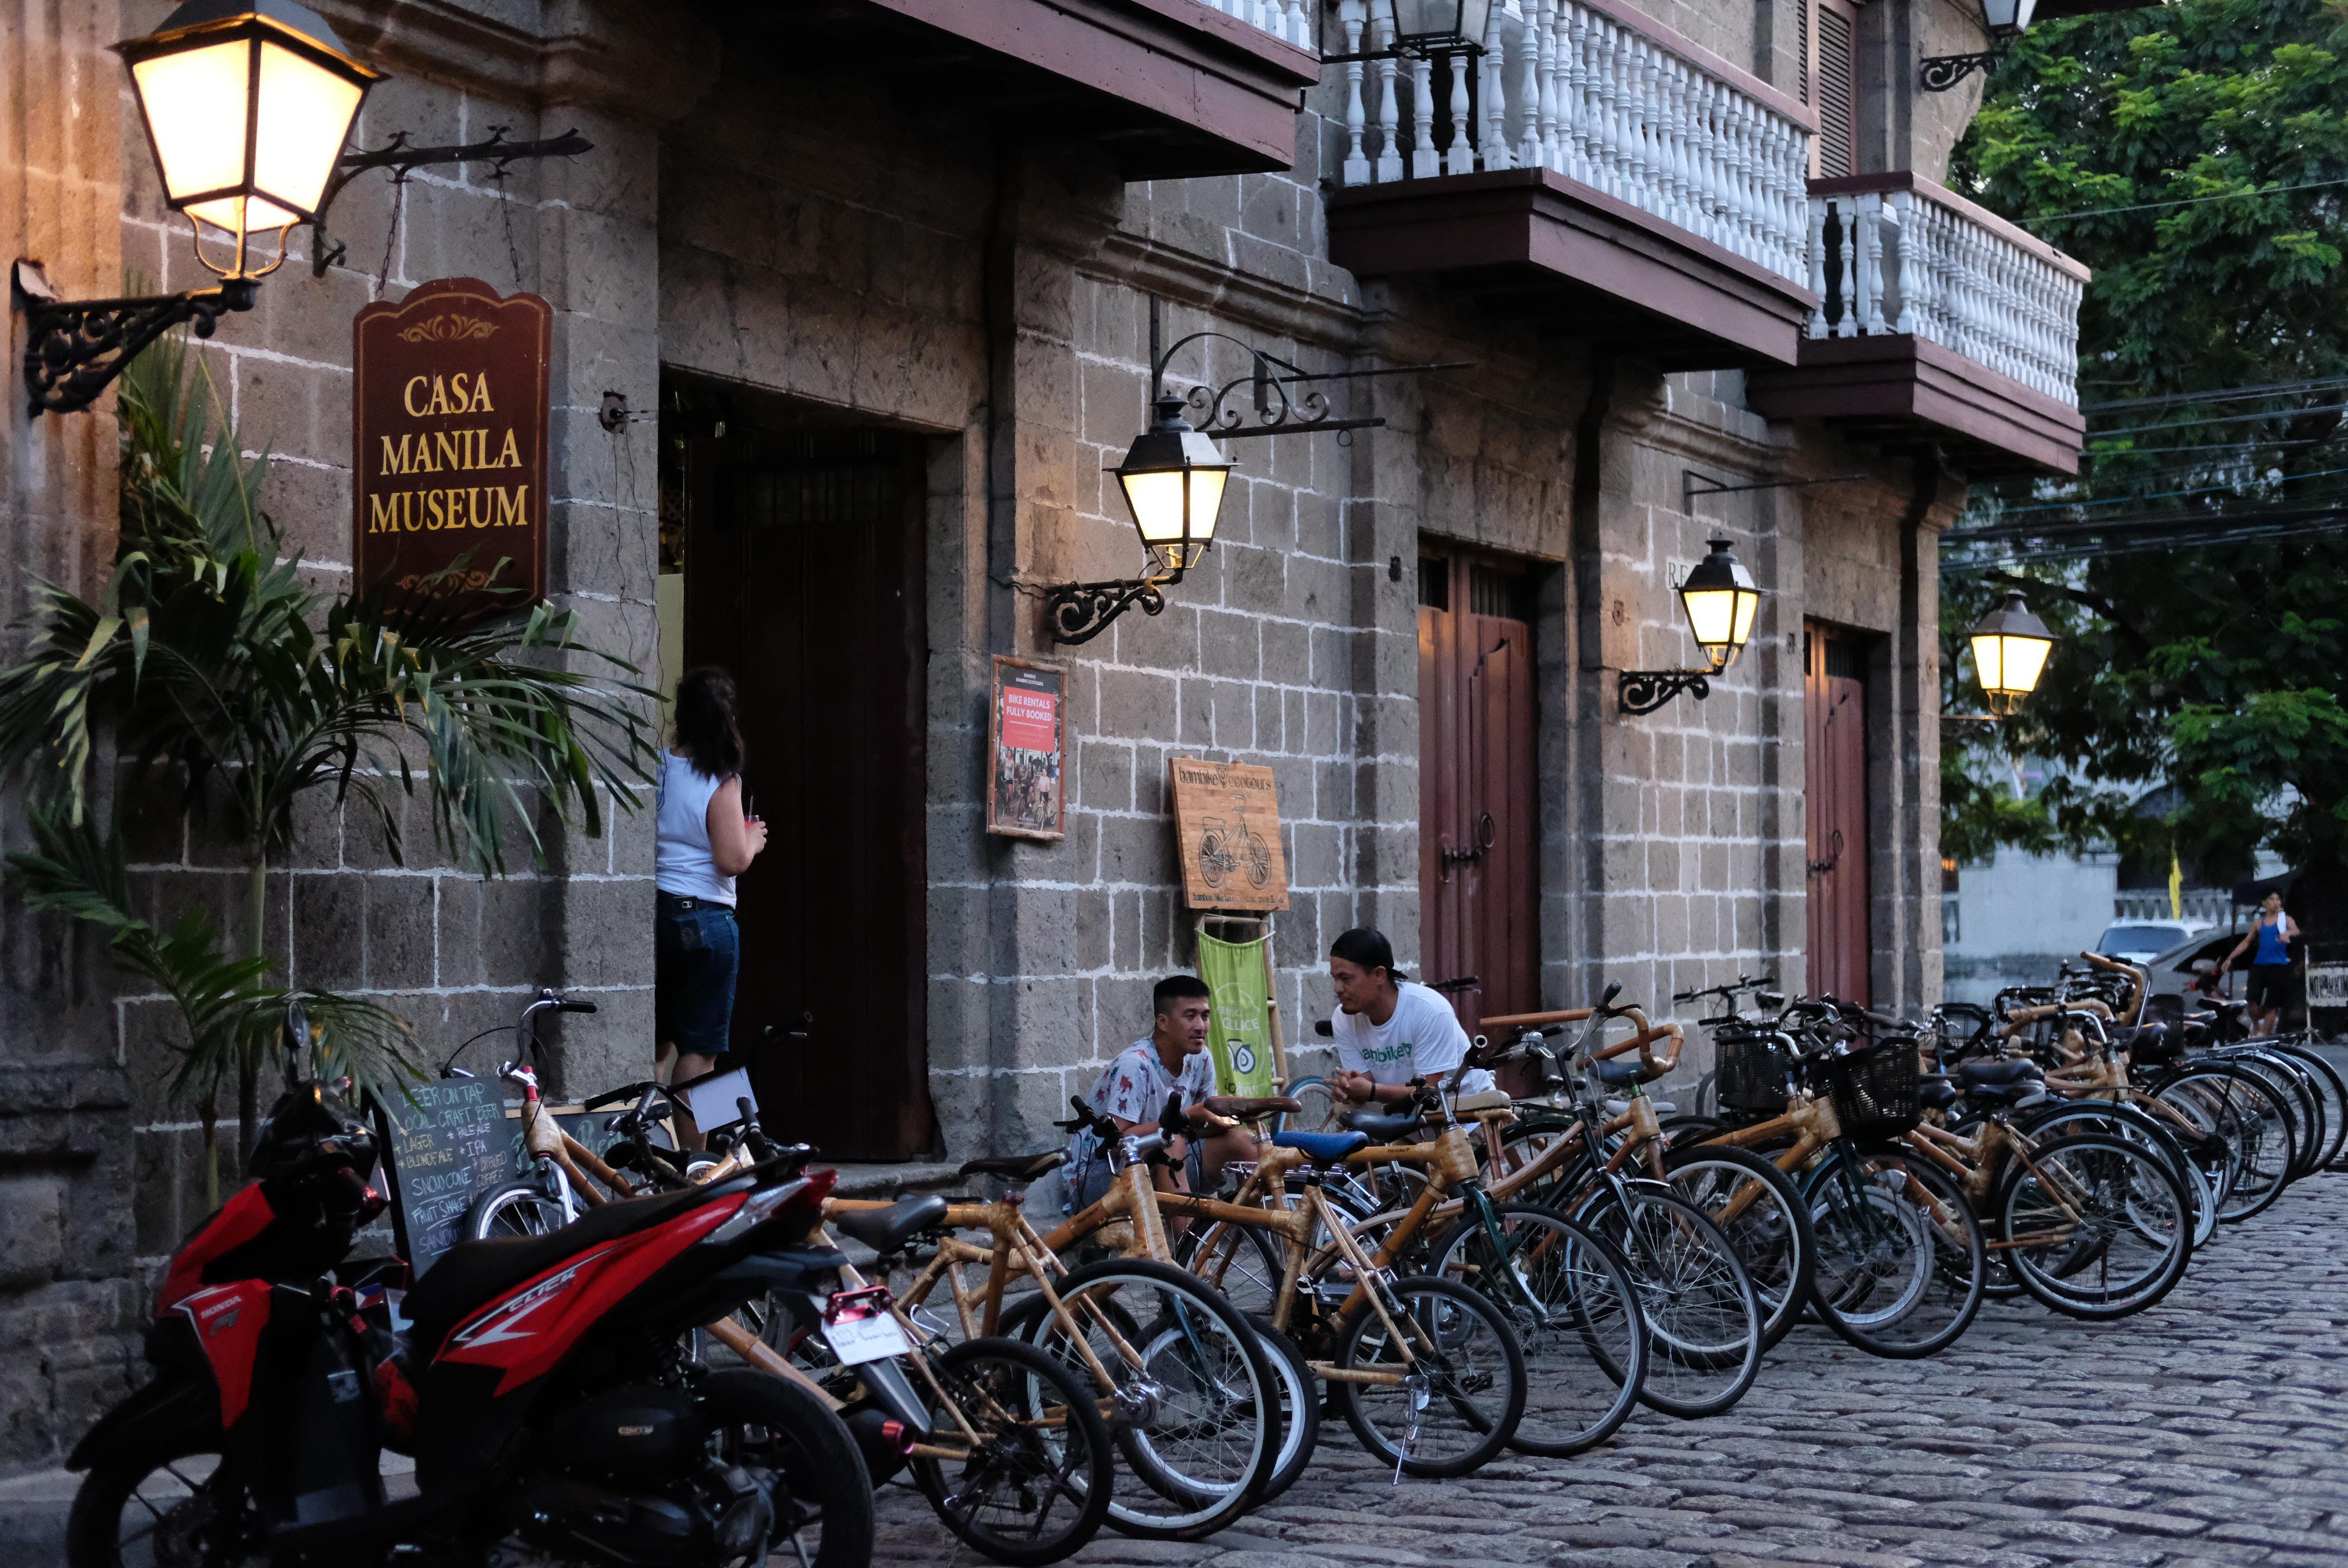 Bikes outside of Casa Manila in Intramuros